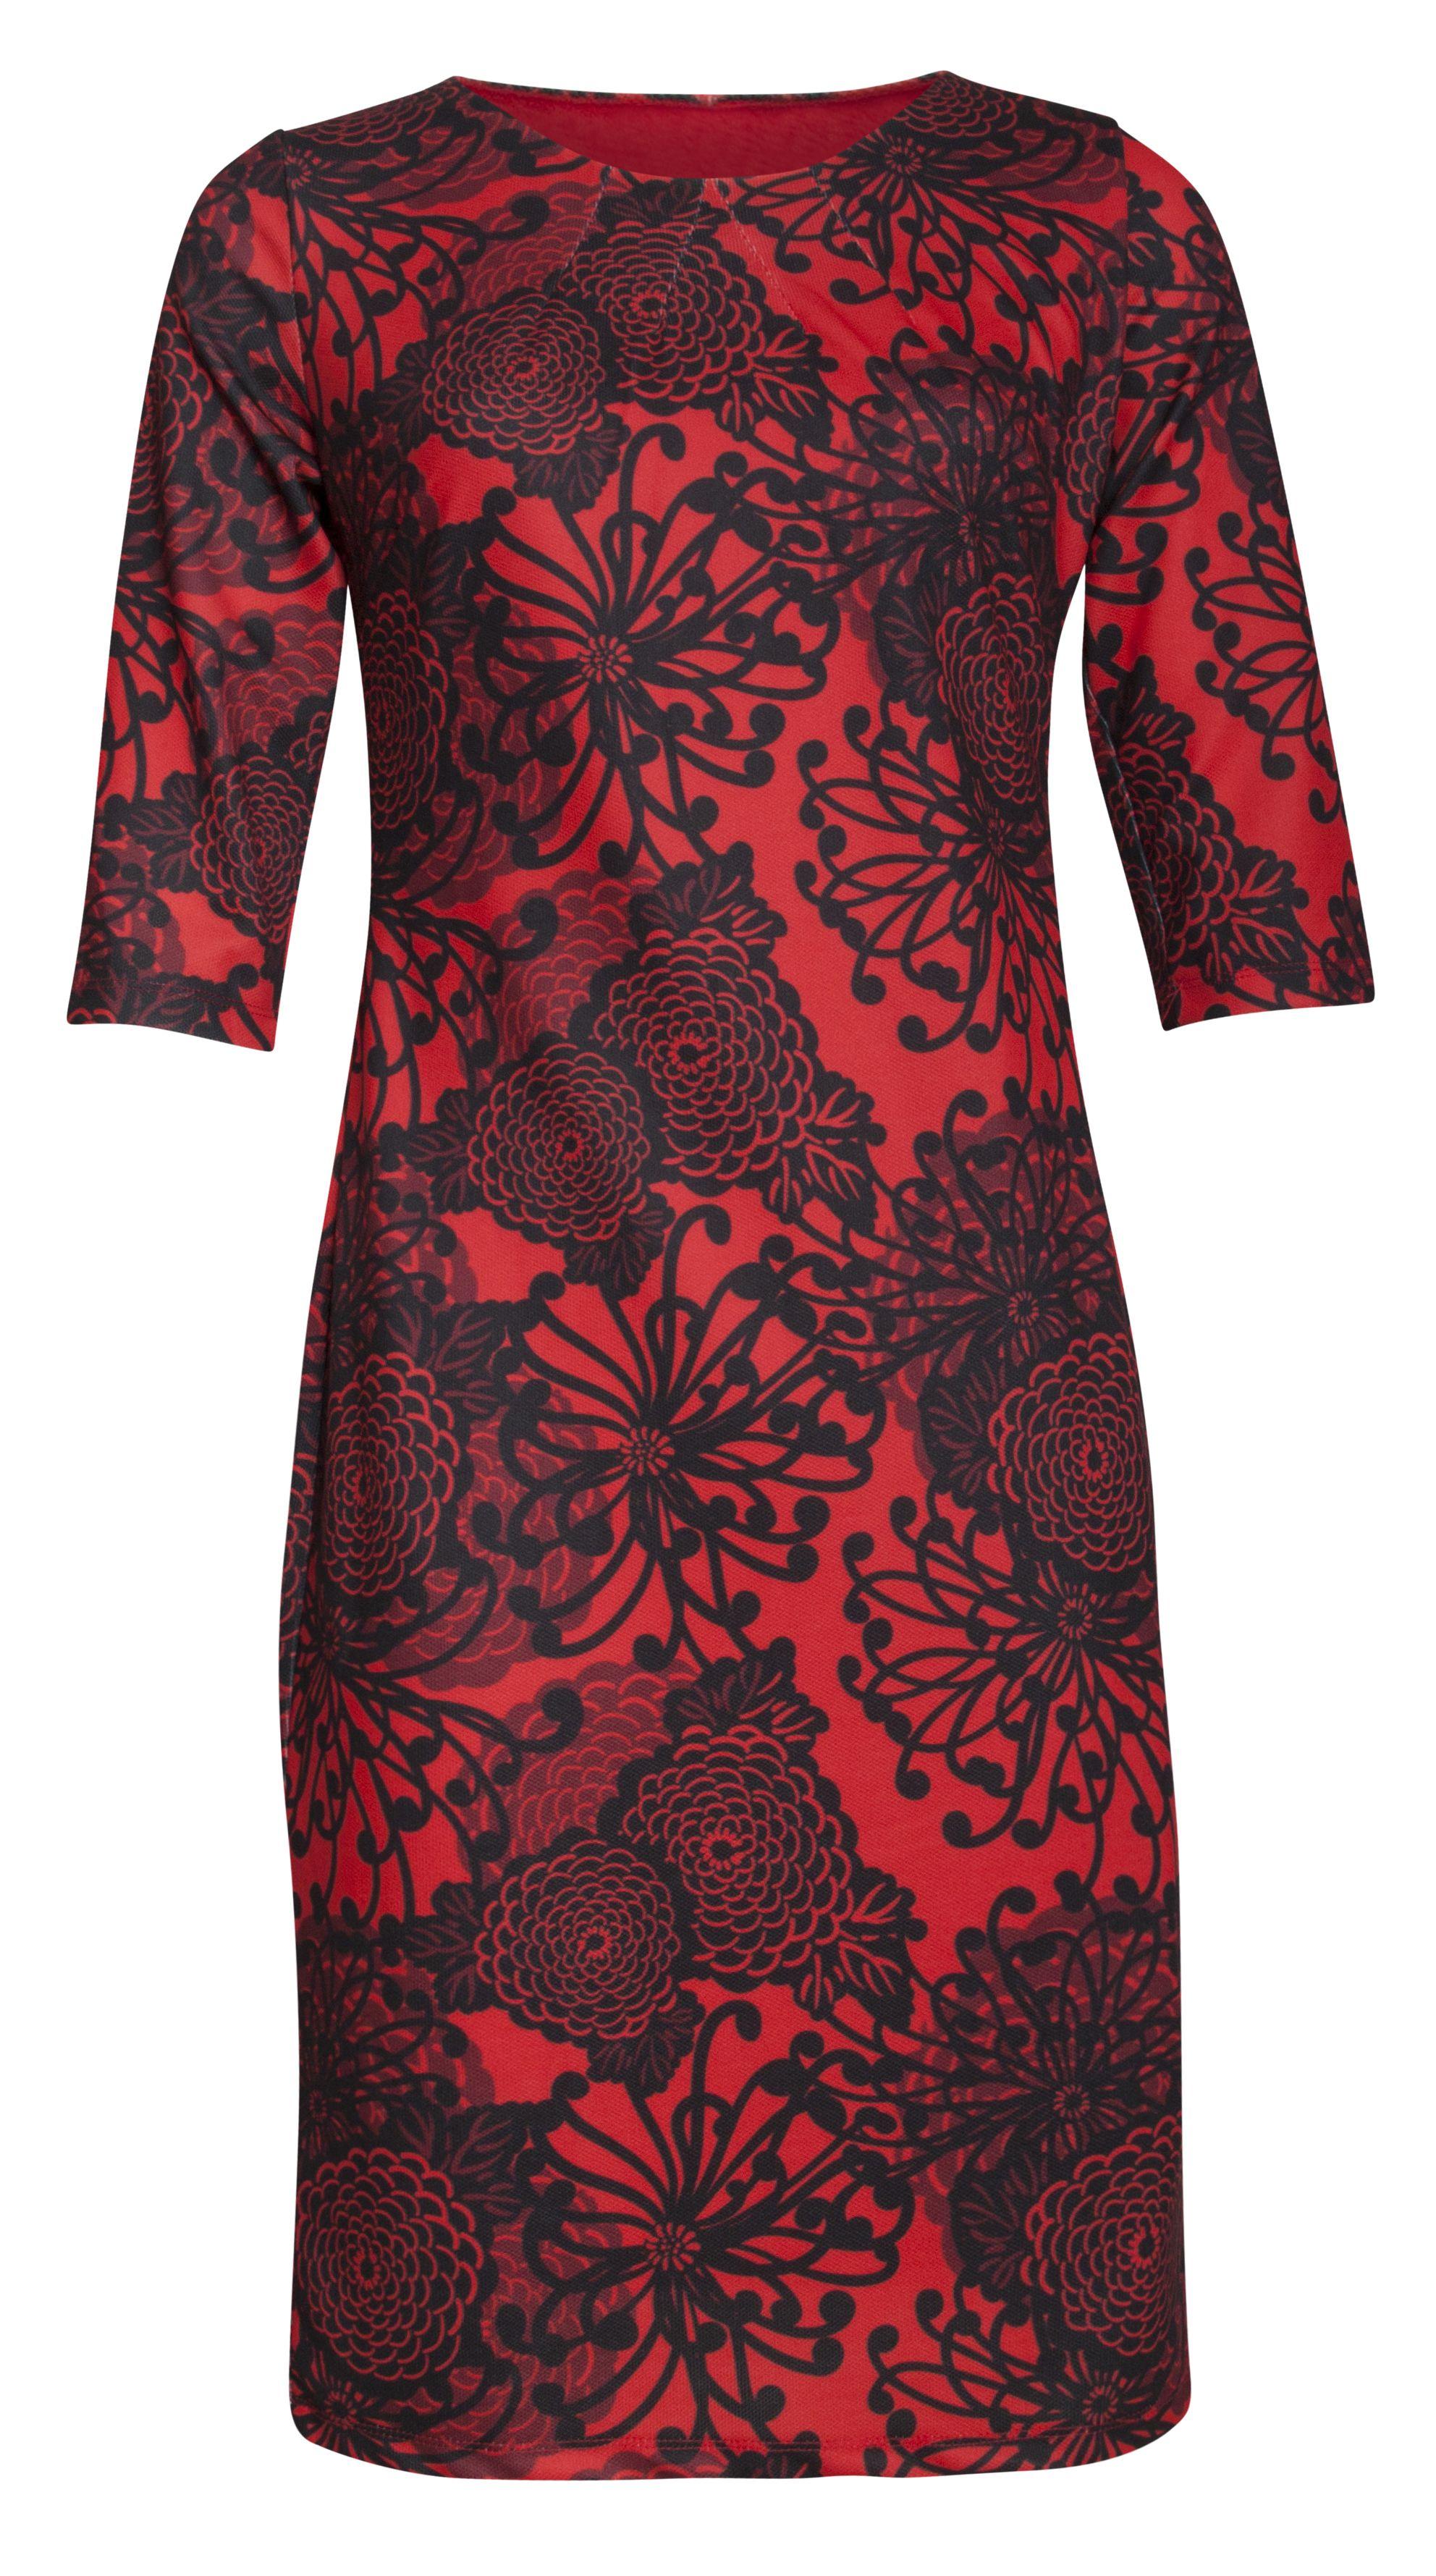 11f7a87df1b8c0 Mooie rode jurk met zwarte bloemenprint van het merk Smashed Lemon ...